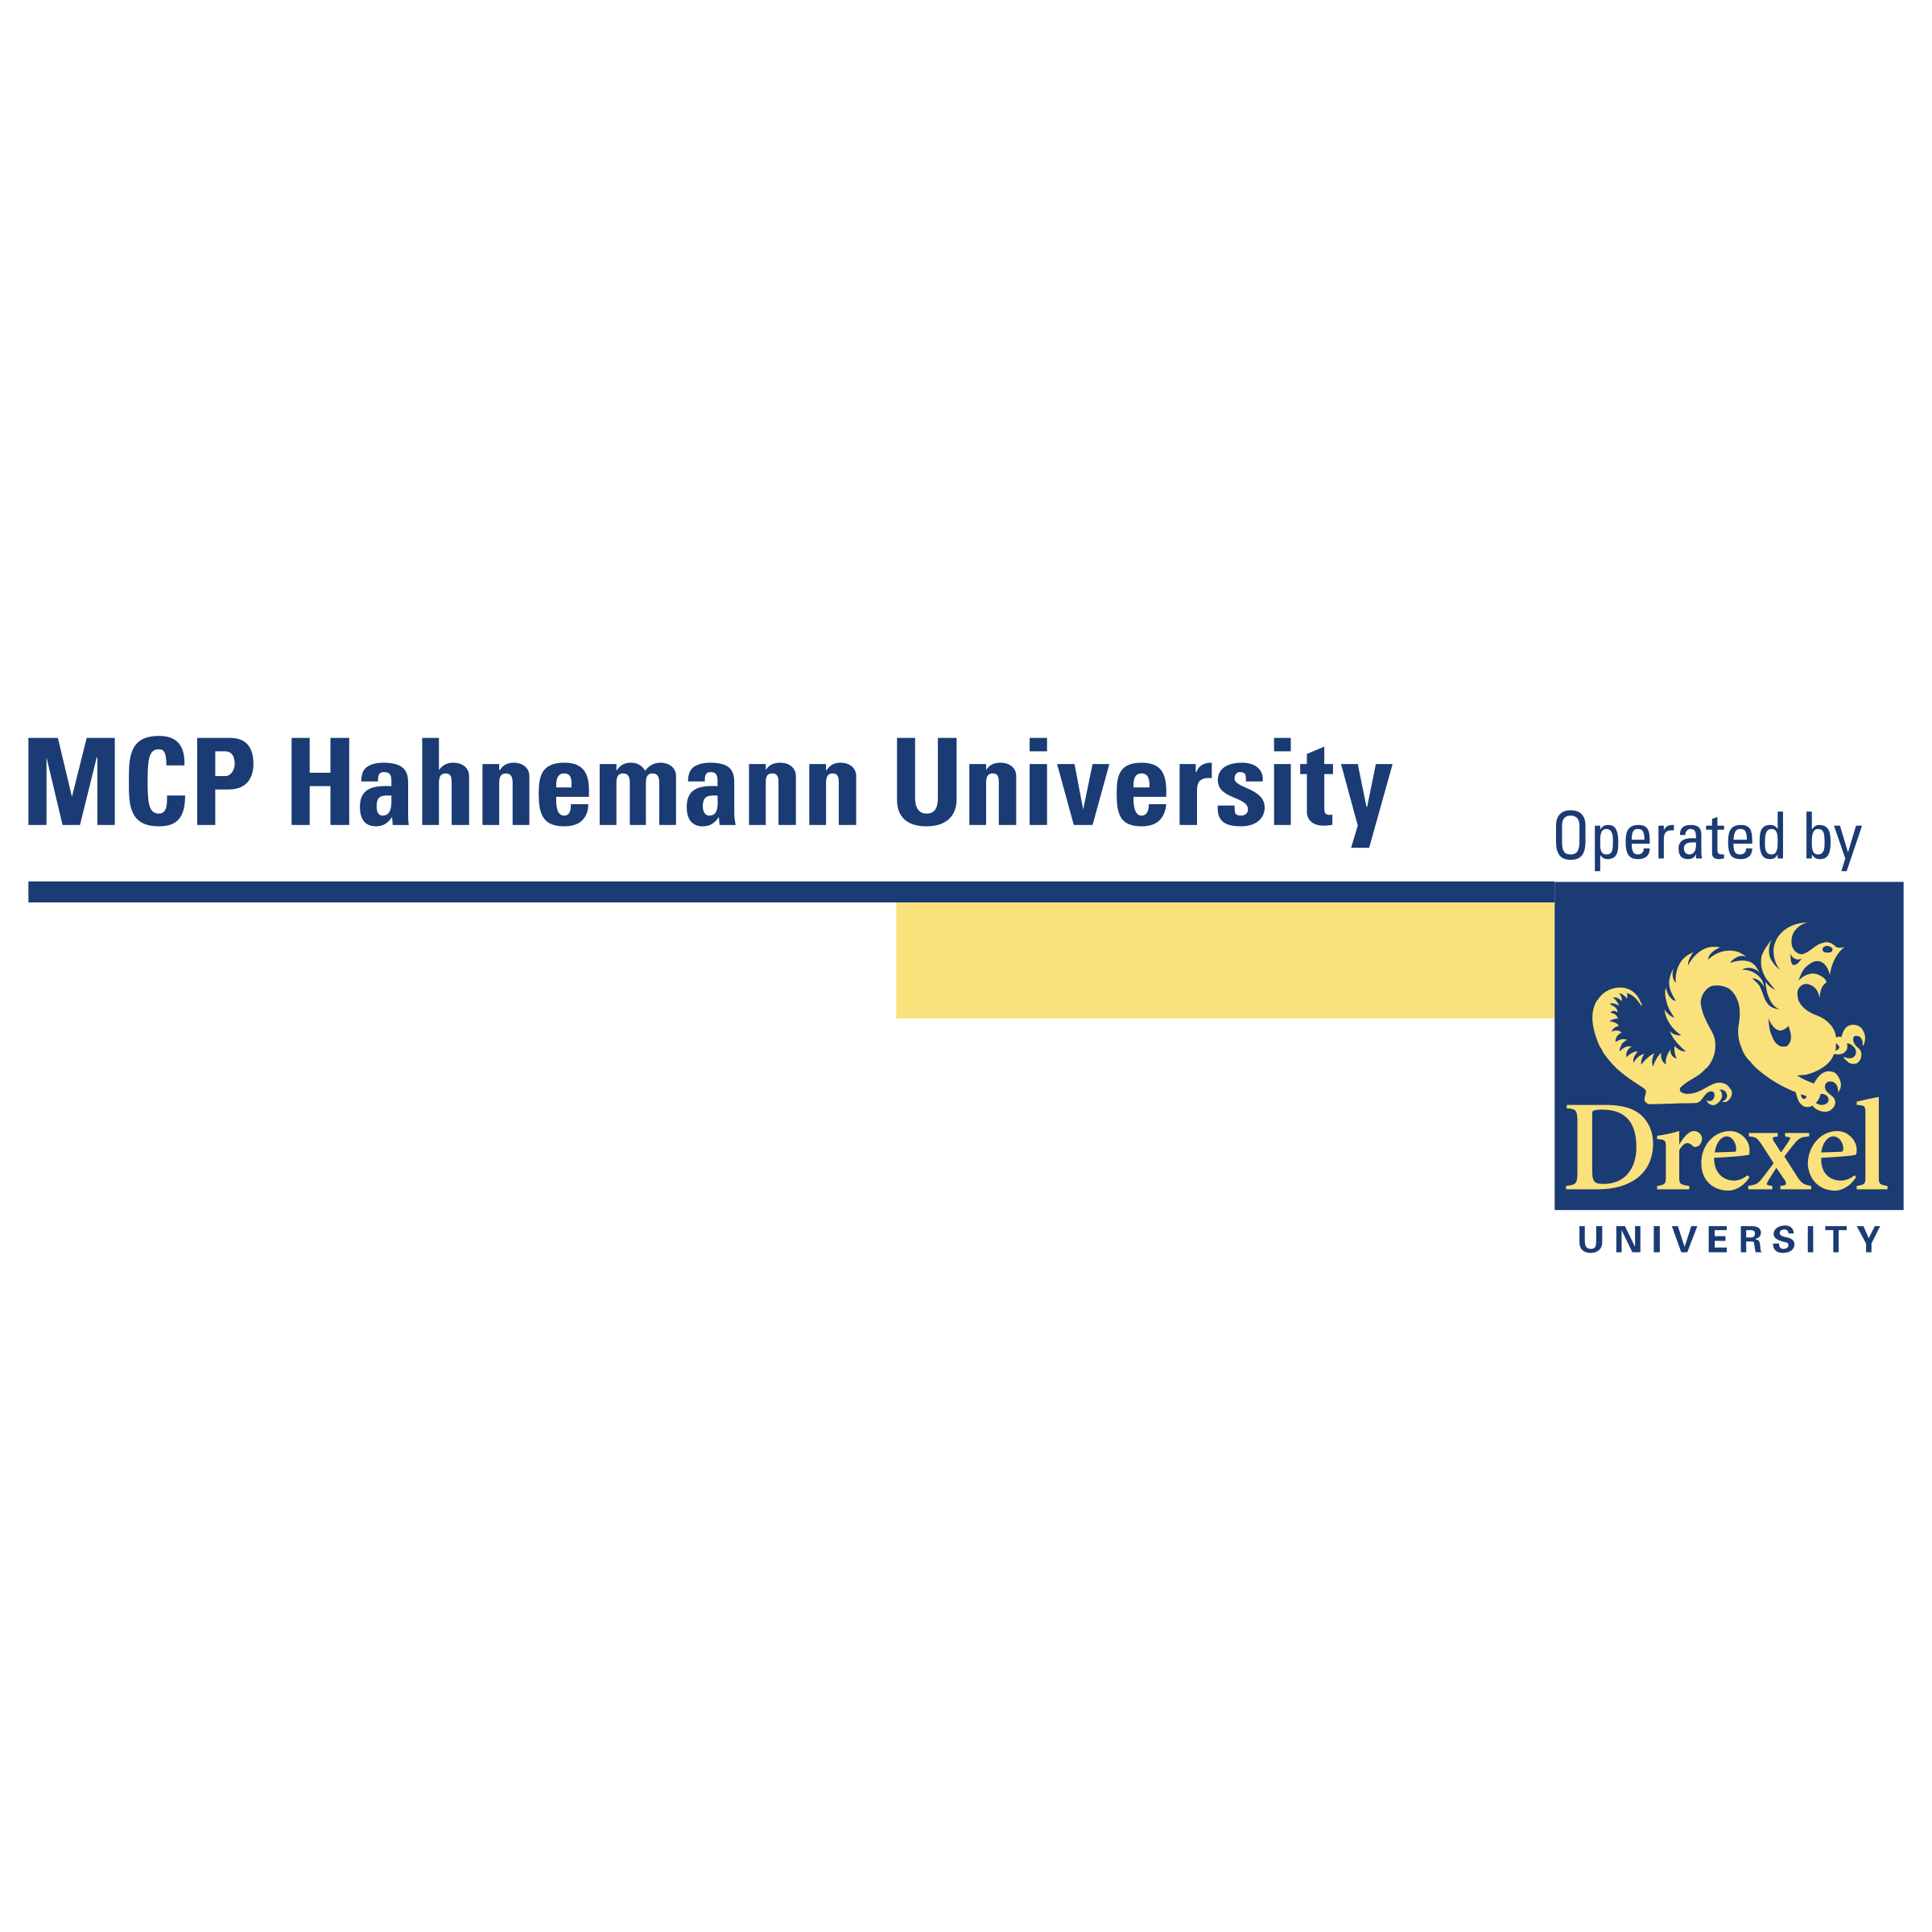 MCP Hahnemann University logo